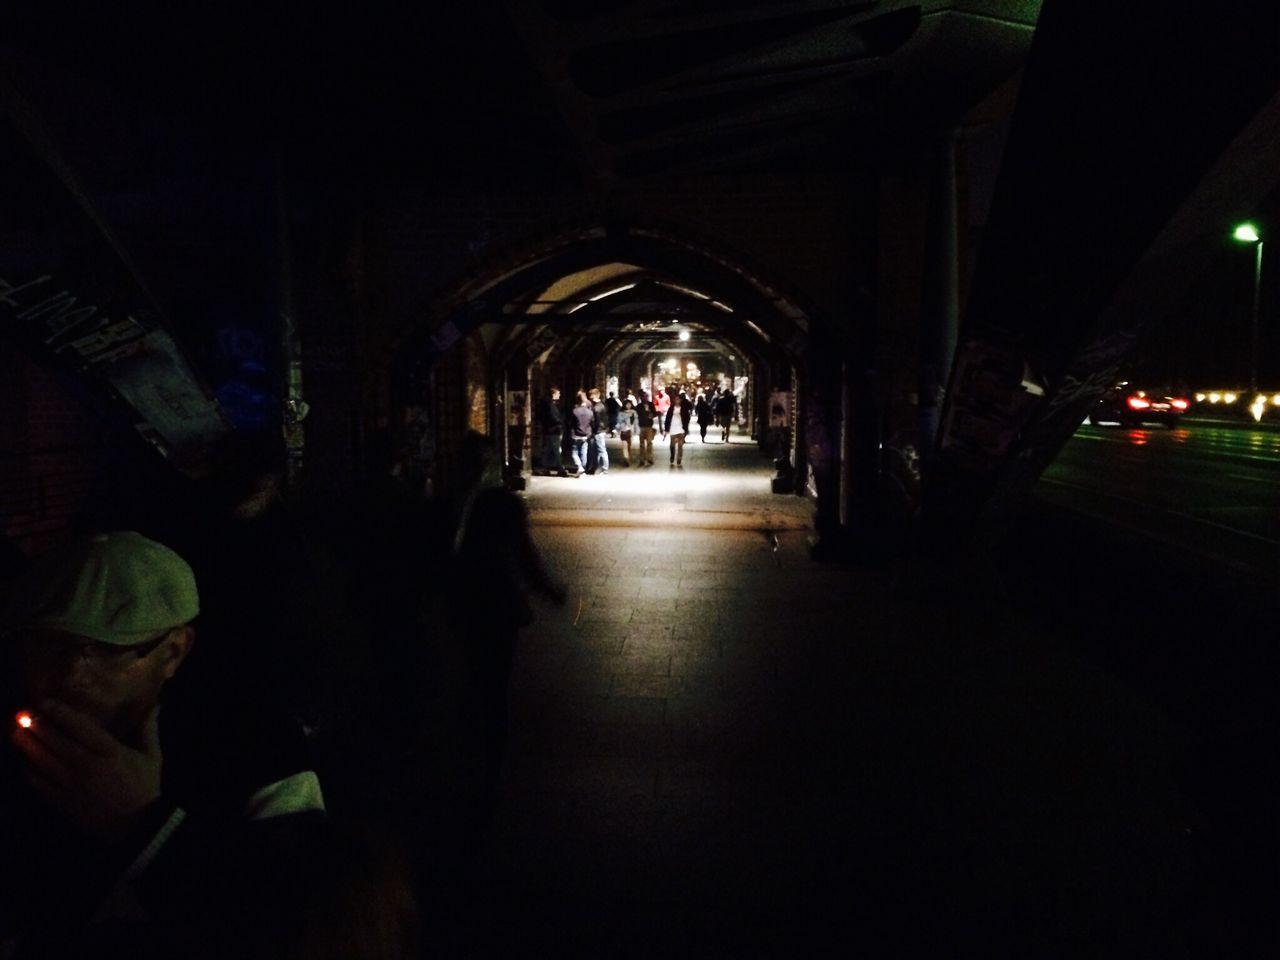 People Walking In Archway By Street